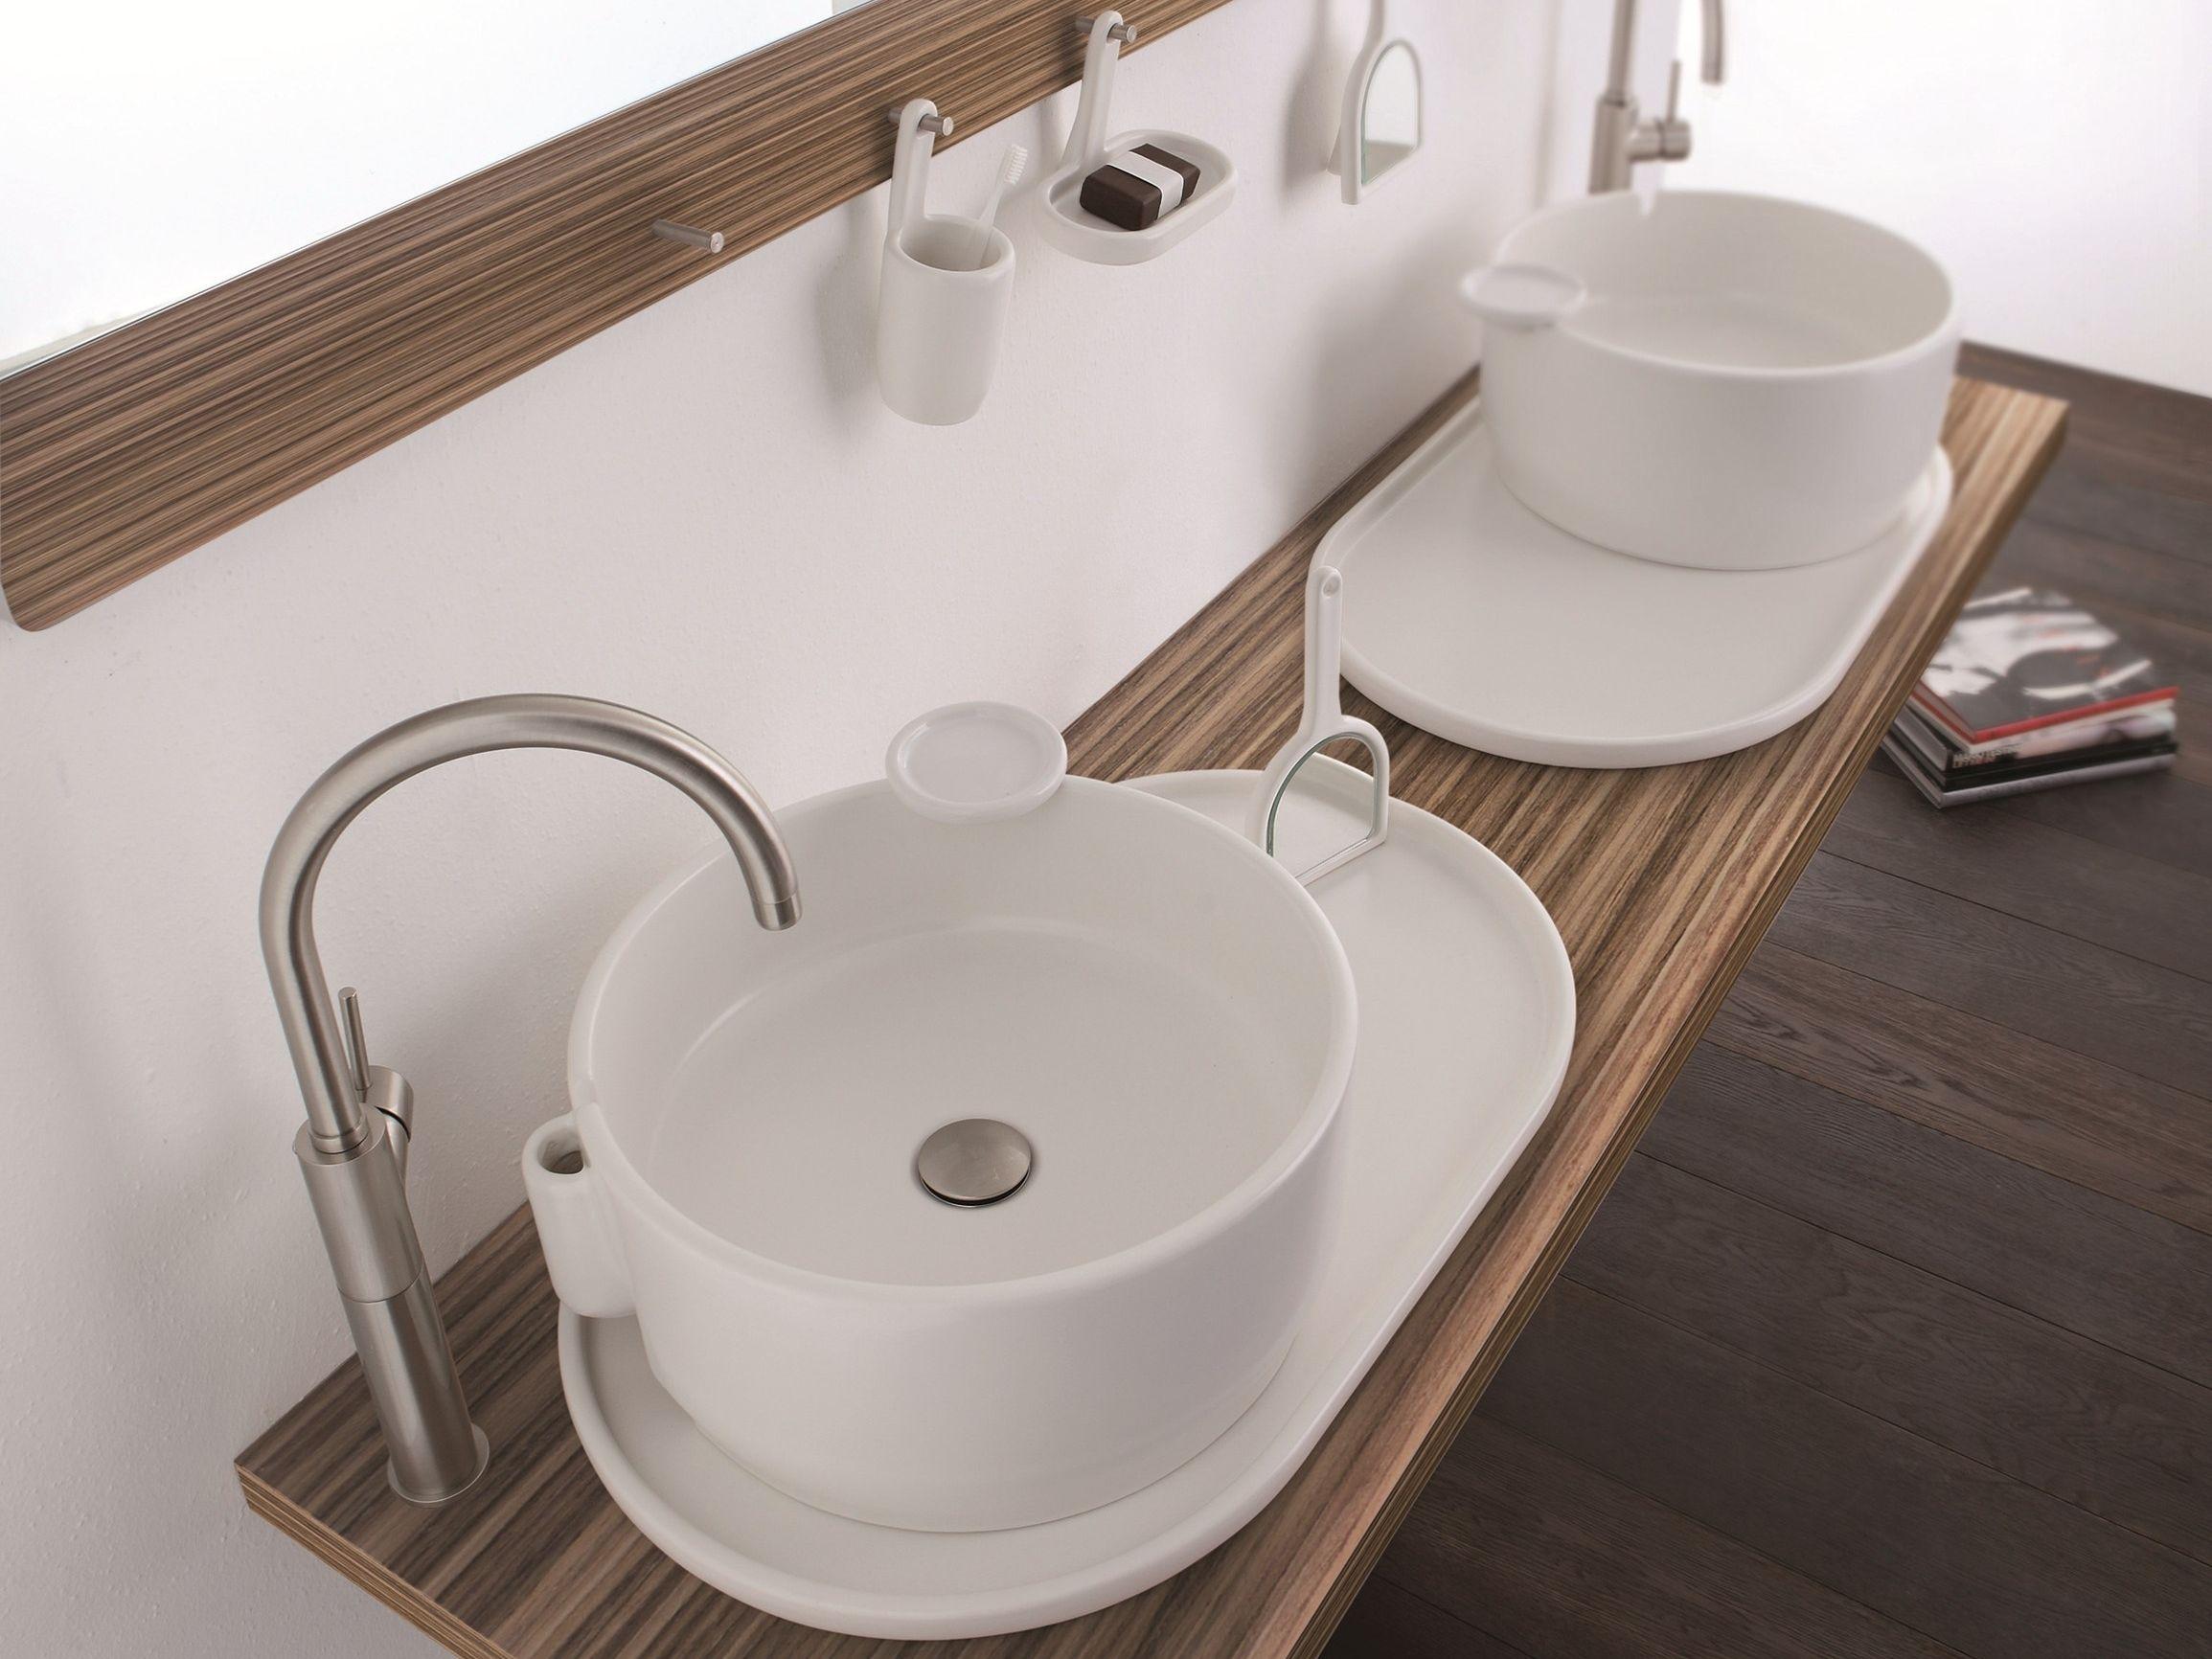 ukiyo e aufsatzwaschbecken by olympia ceramica. Black Bedroom Furniture Sets. Home Design Ideas